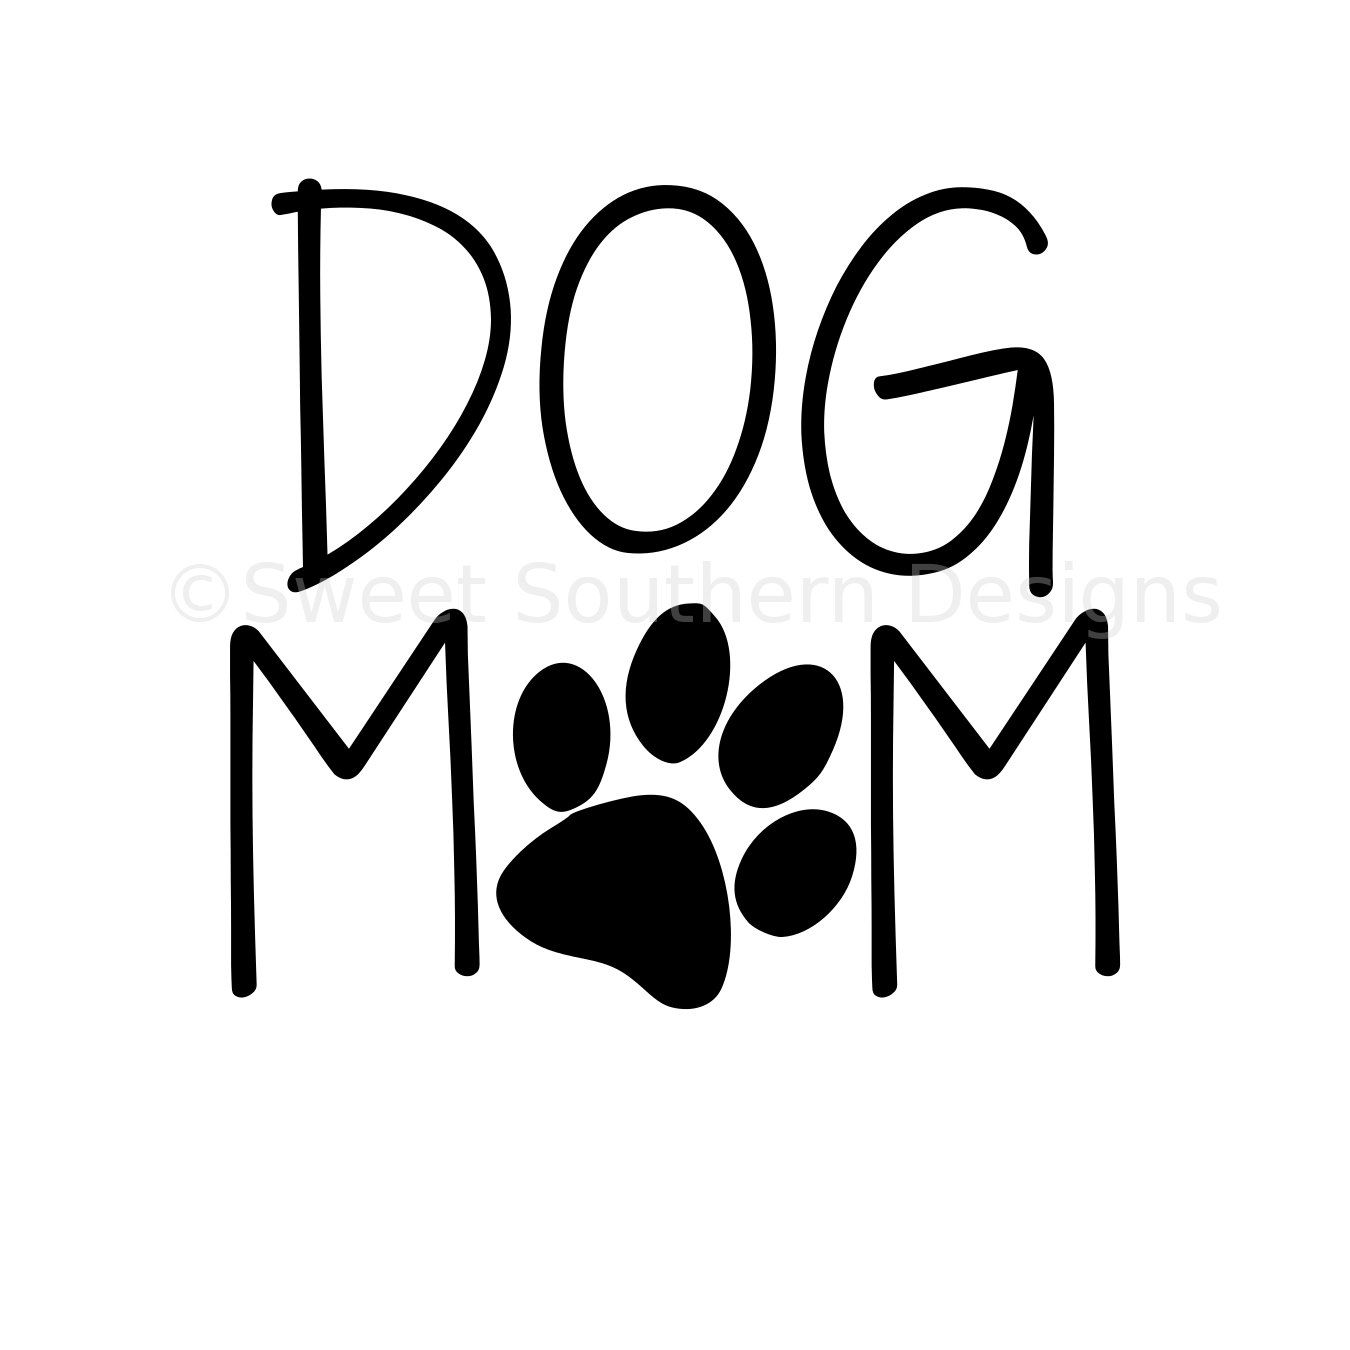 fur mama svg Dog Lover SVG for Cricut and Silhouette Dog Mama svg pet Mom svg dog lover svg Dog Mom SVG